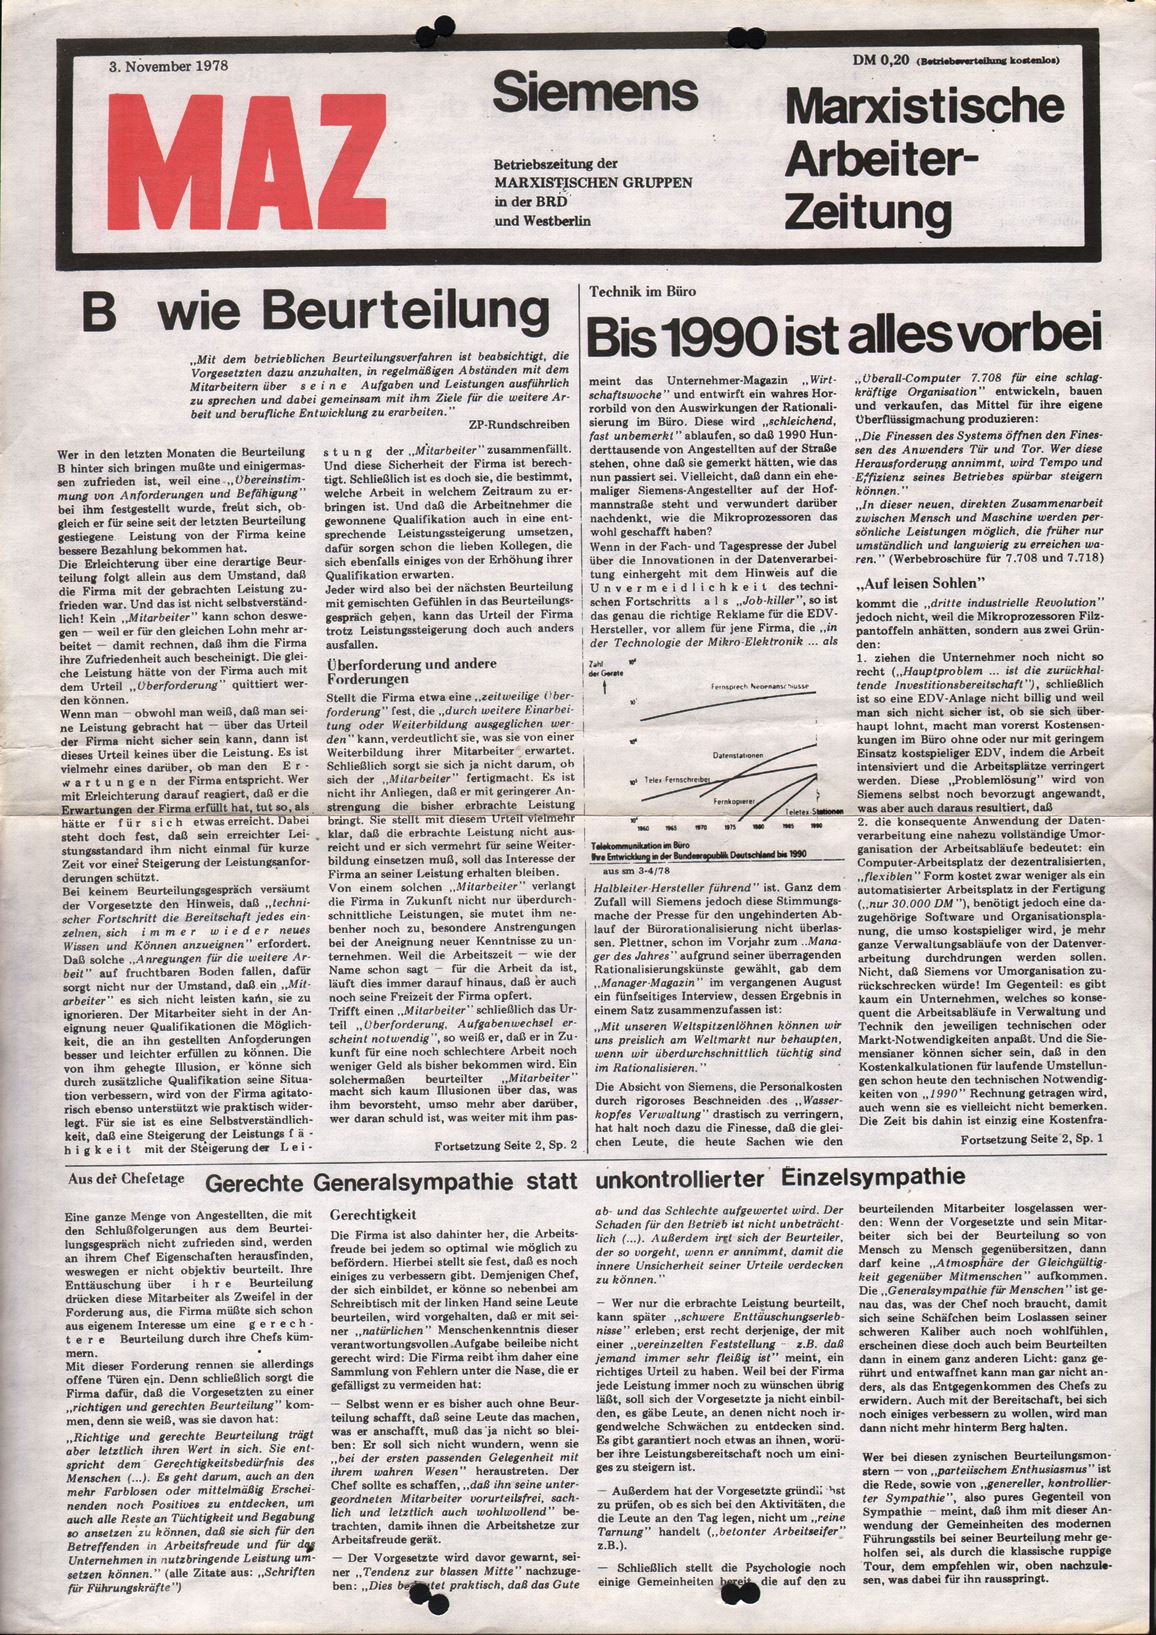 Muenchen_MG_MAZ_Siemens_19781103_01